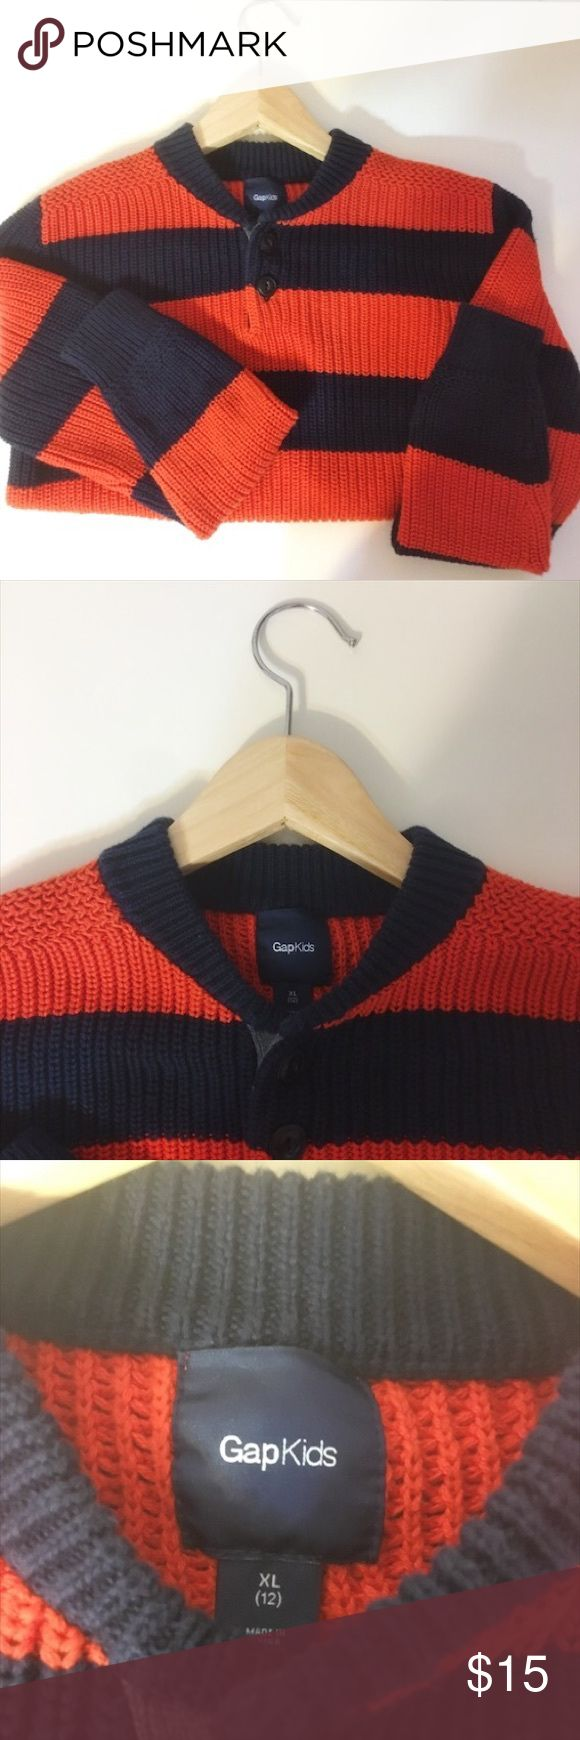 Gap Kids Boys Knit Sweater Gently warm Gapkids Boys Sweater GAP Shirts & Tops Sweaters